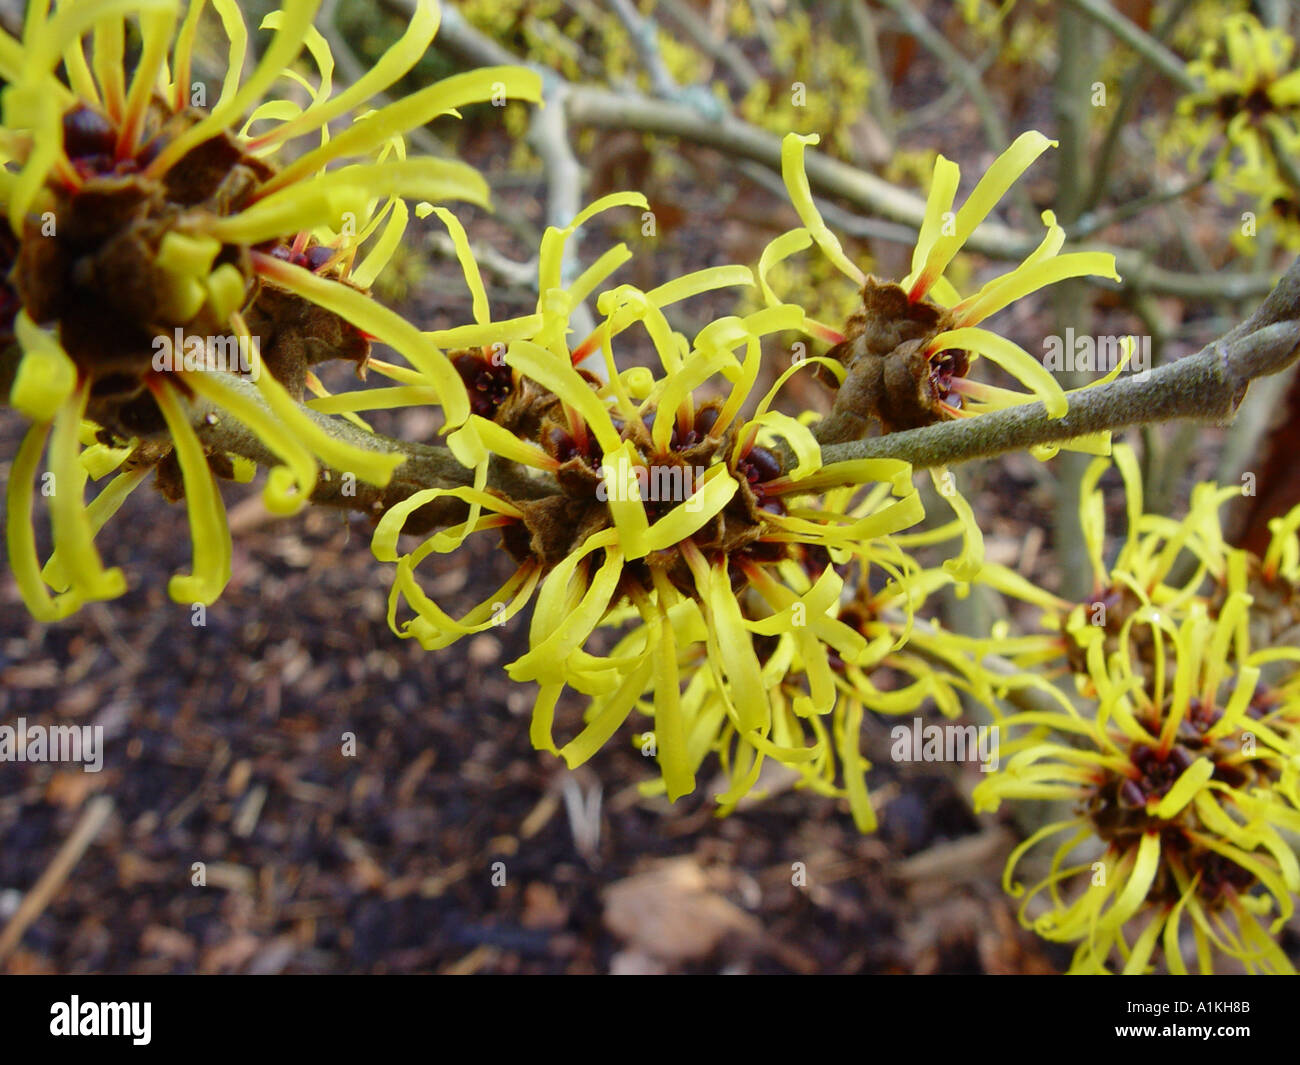 hamamelis x intermedia jermyns gold winter flowering garden shrub